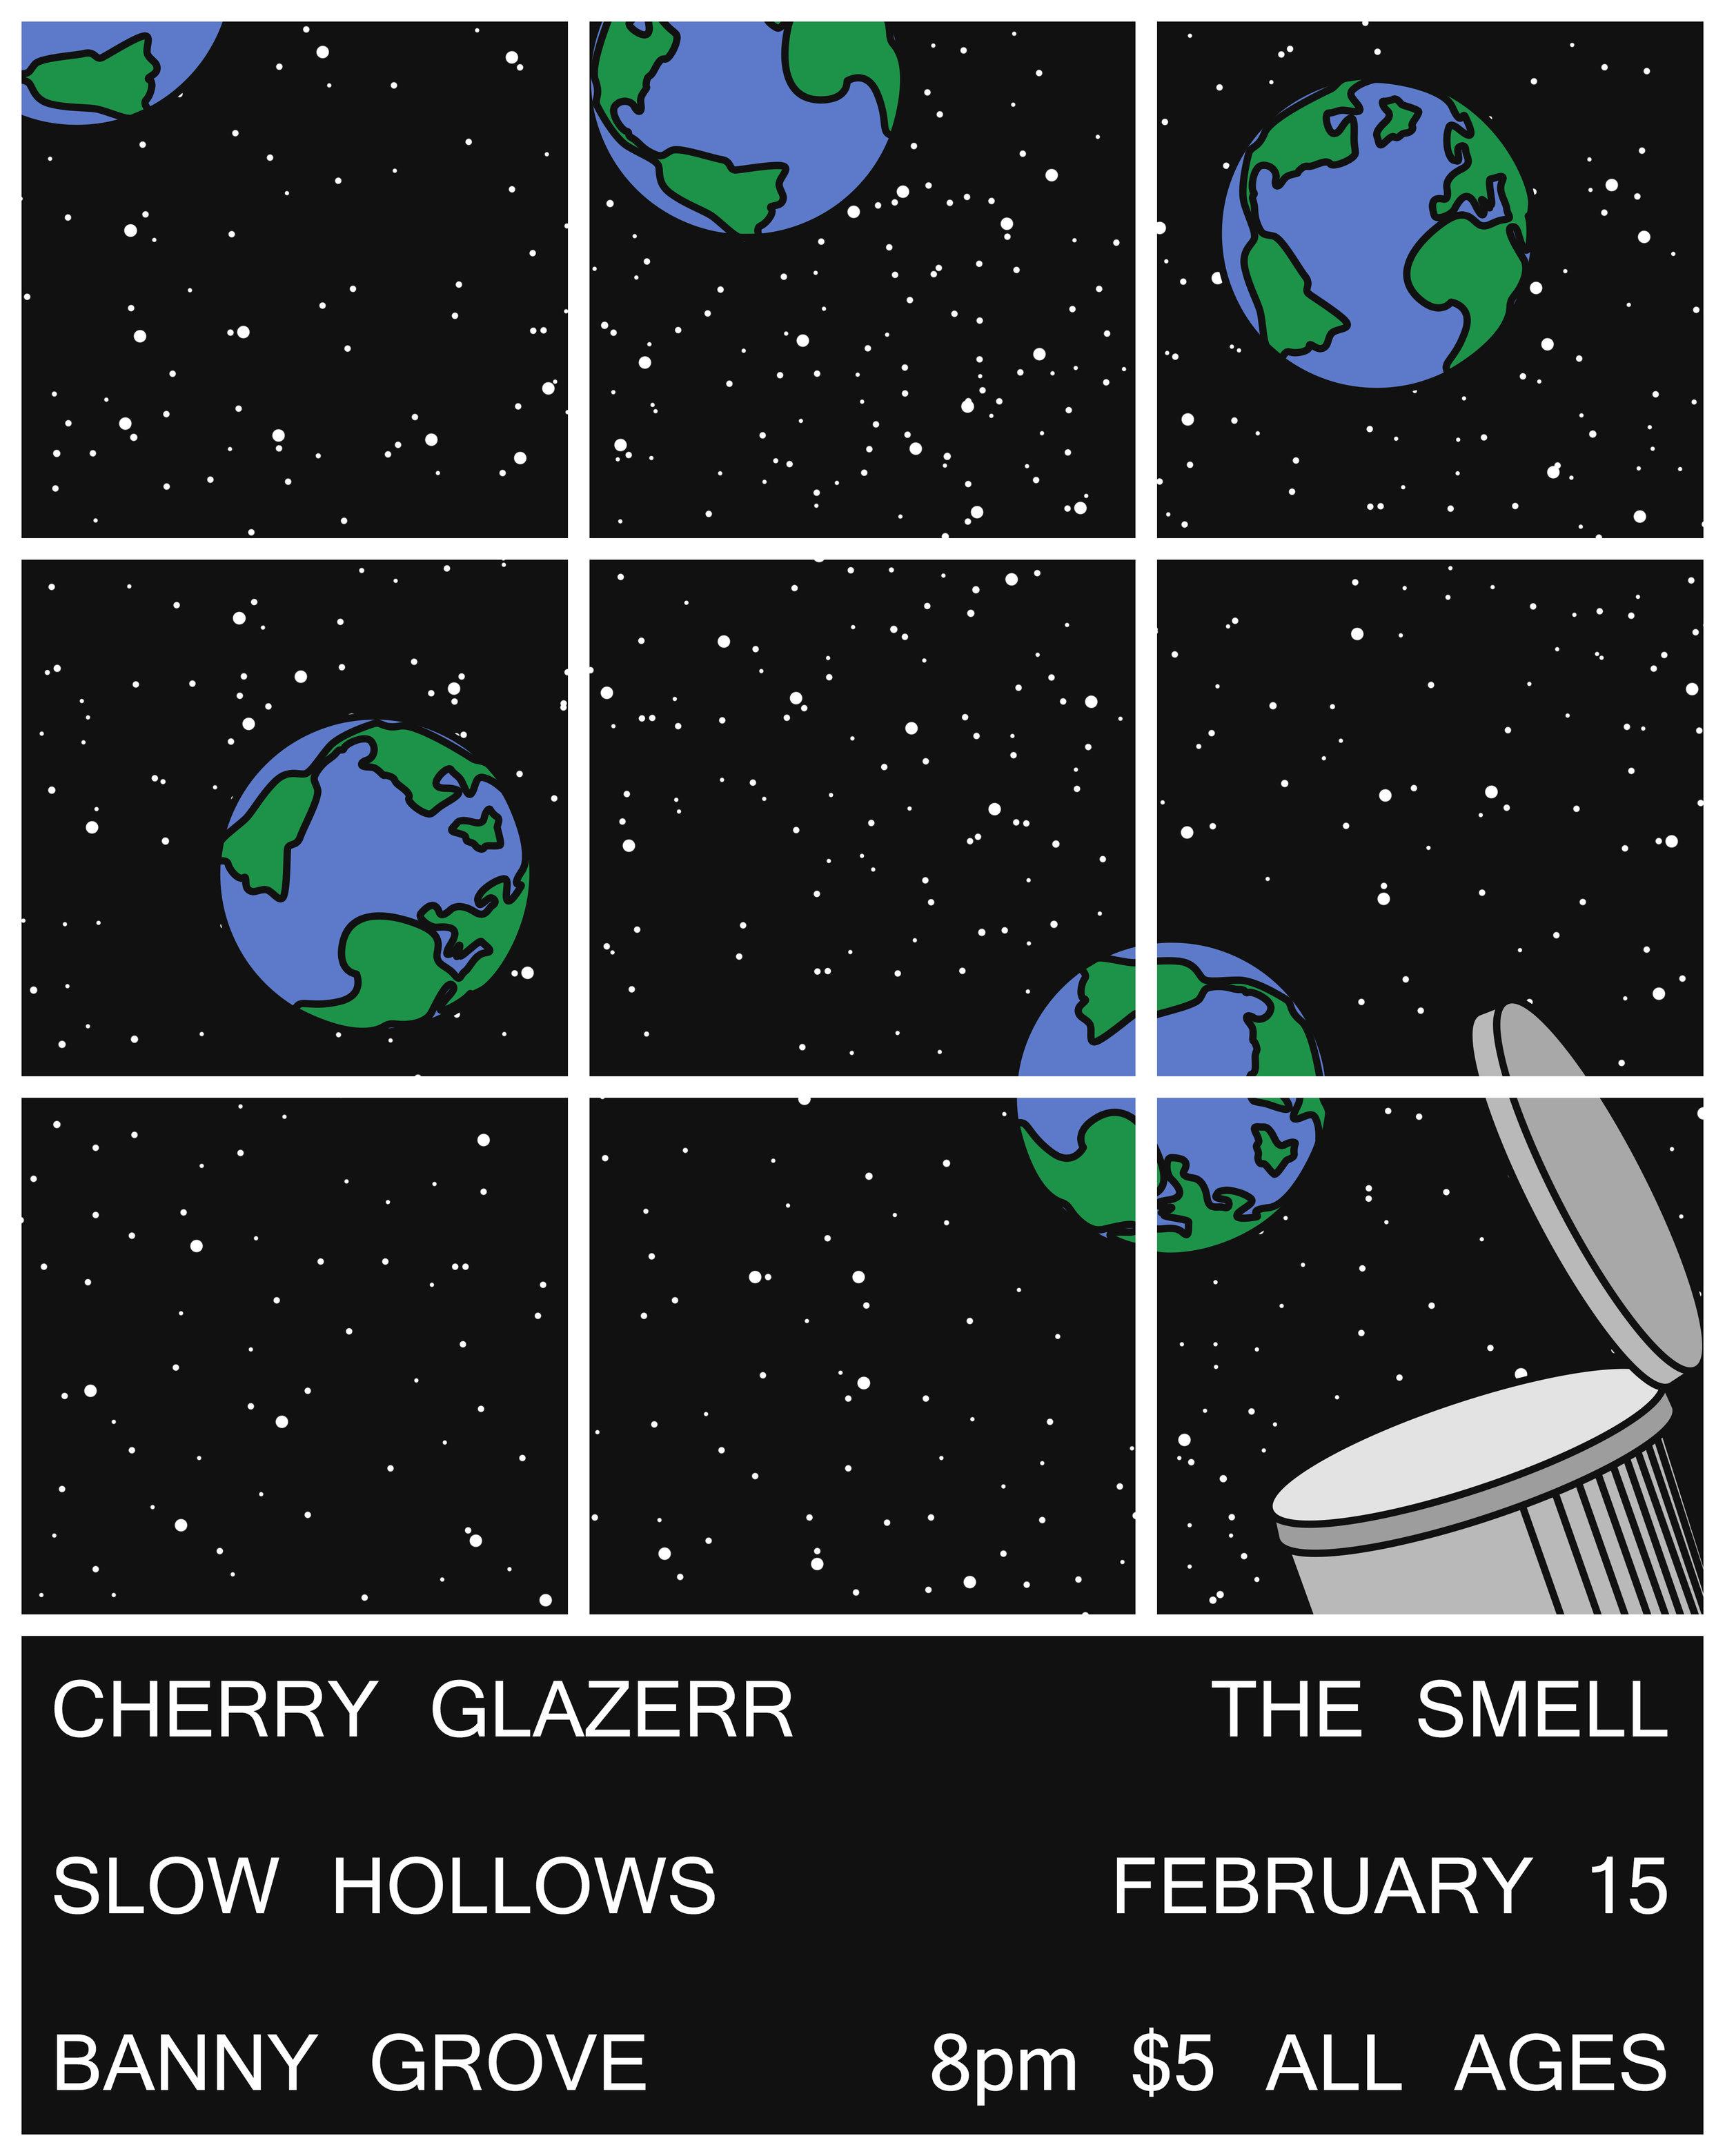 Flyer for Cherry Glazerr